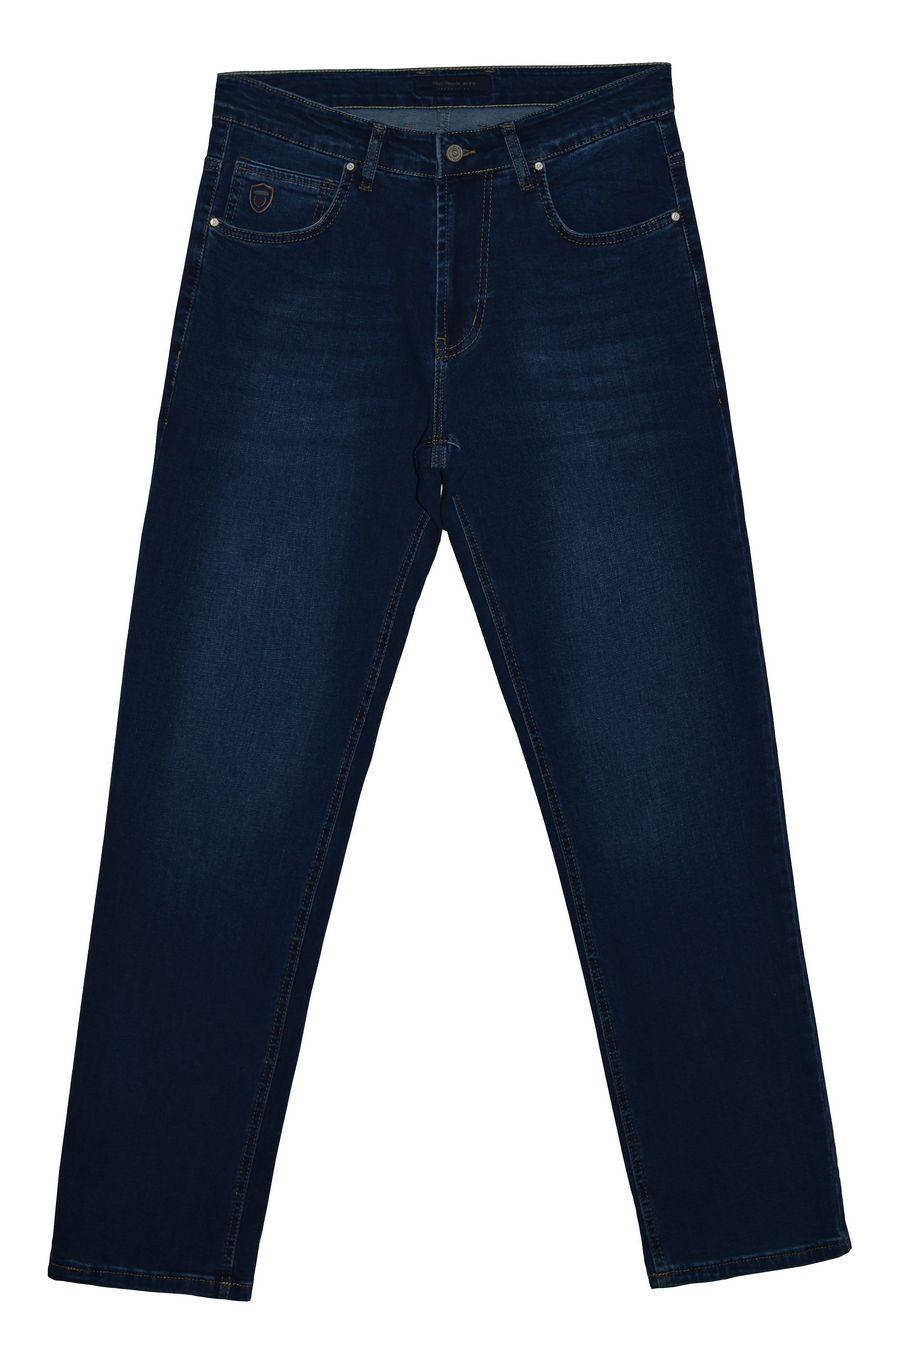 Джинсы мужские MAC Person 2923-12321 Blue Blue - фото 1